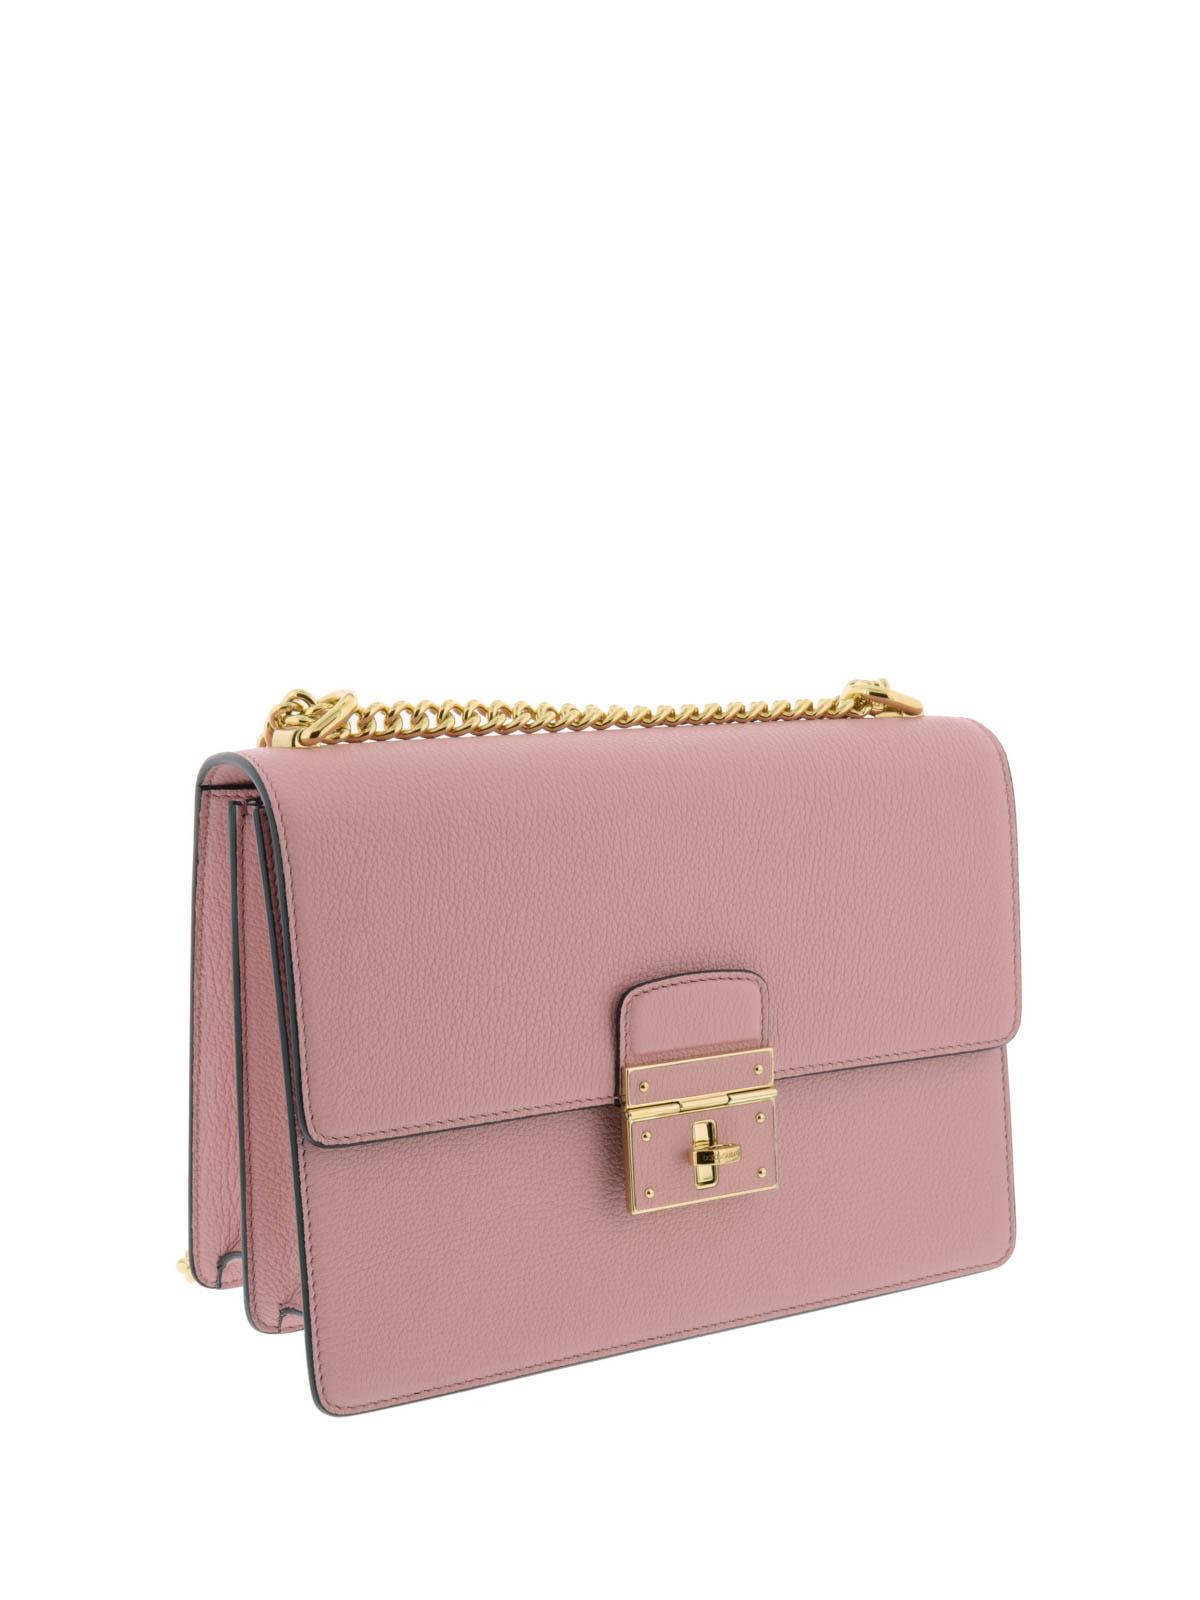 a8df4018e2e98 DOLCE   GABBANA  shoulder bags online - Lock closure Rosalia chain bag